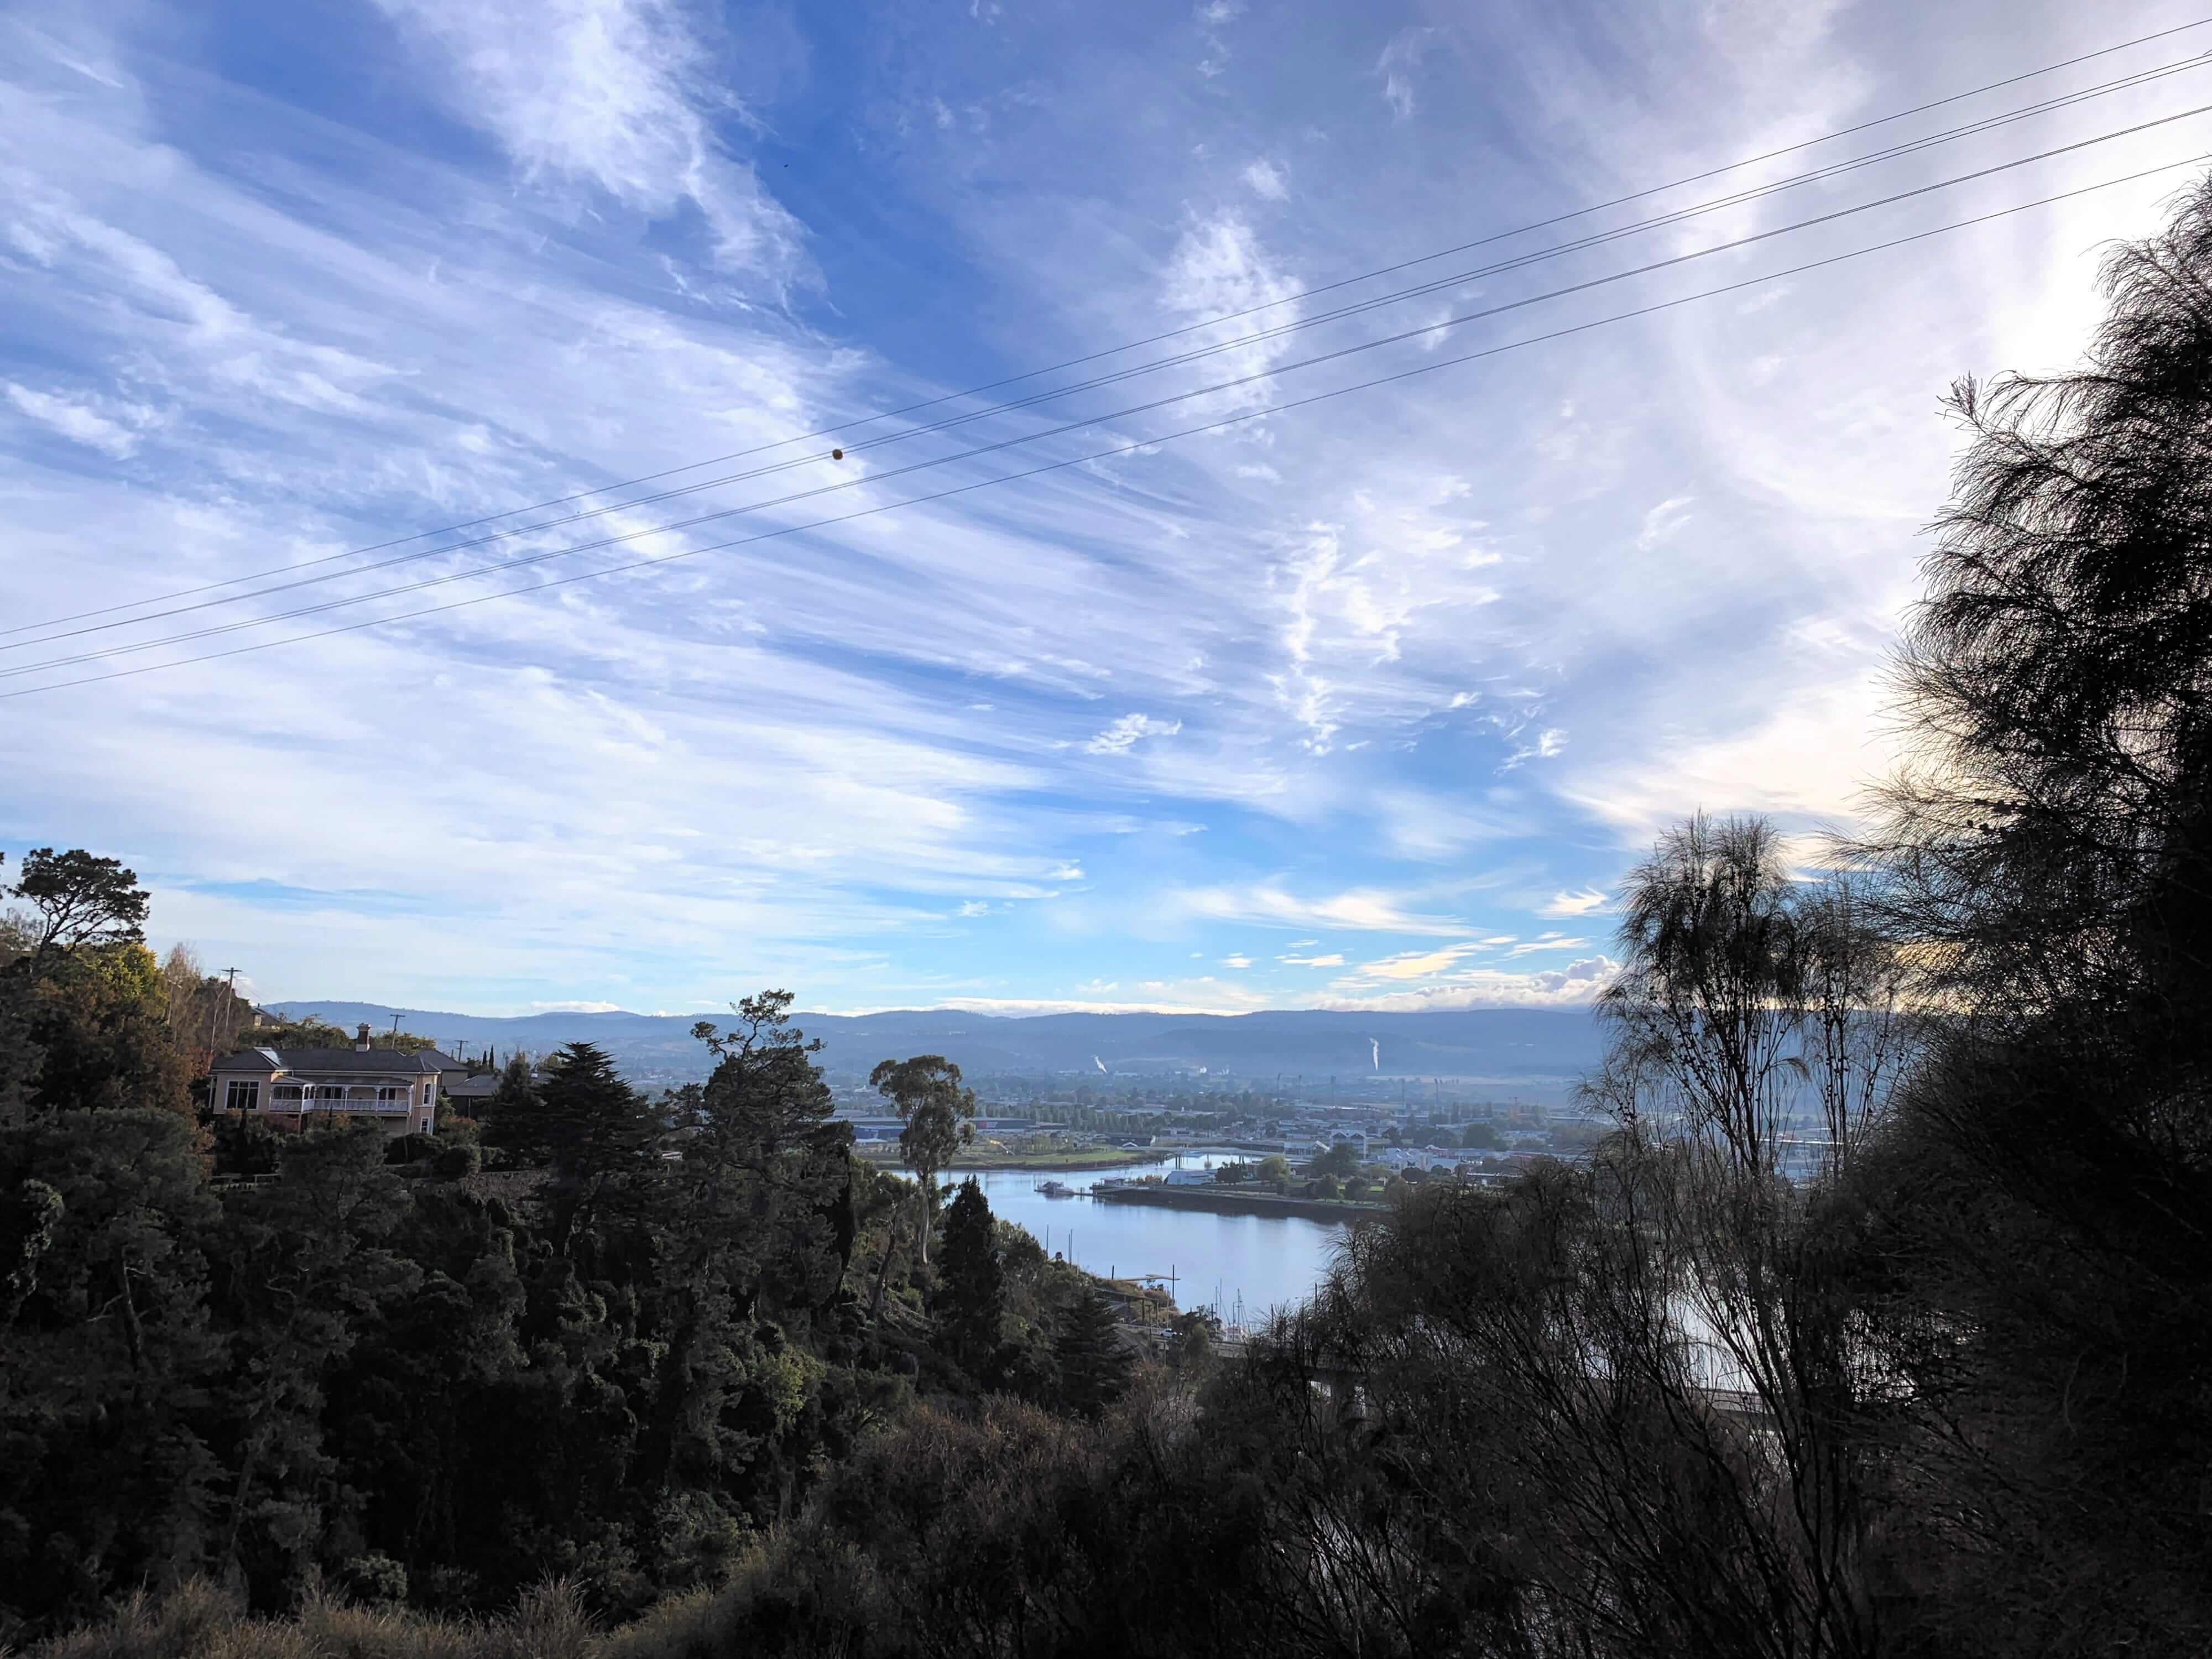 clouds moving towards the sunset, Launceston, Tasmania